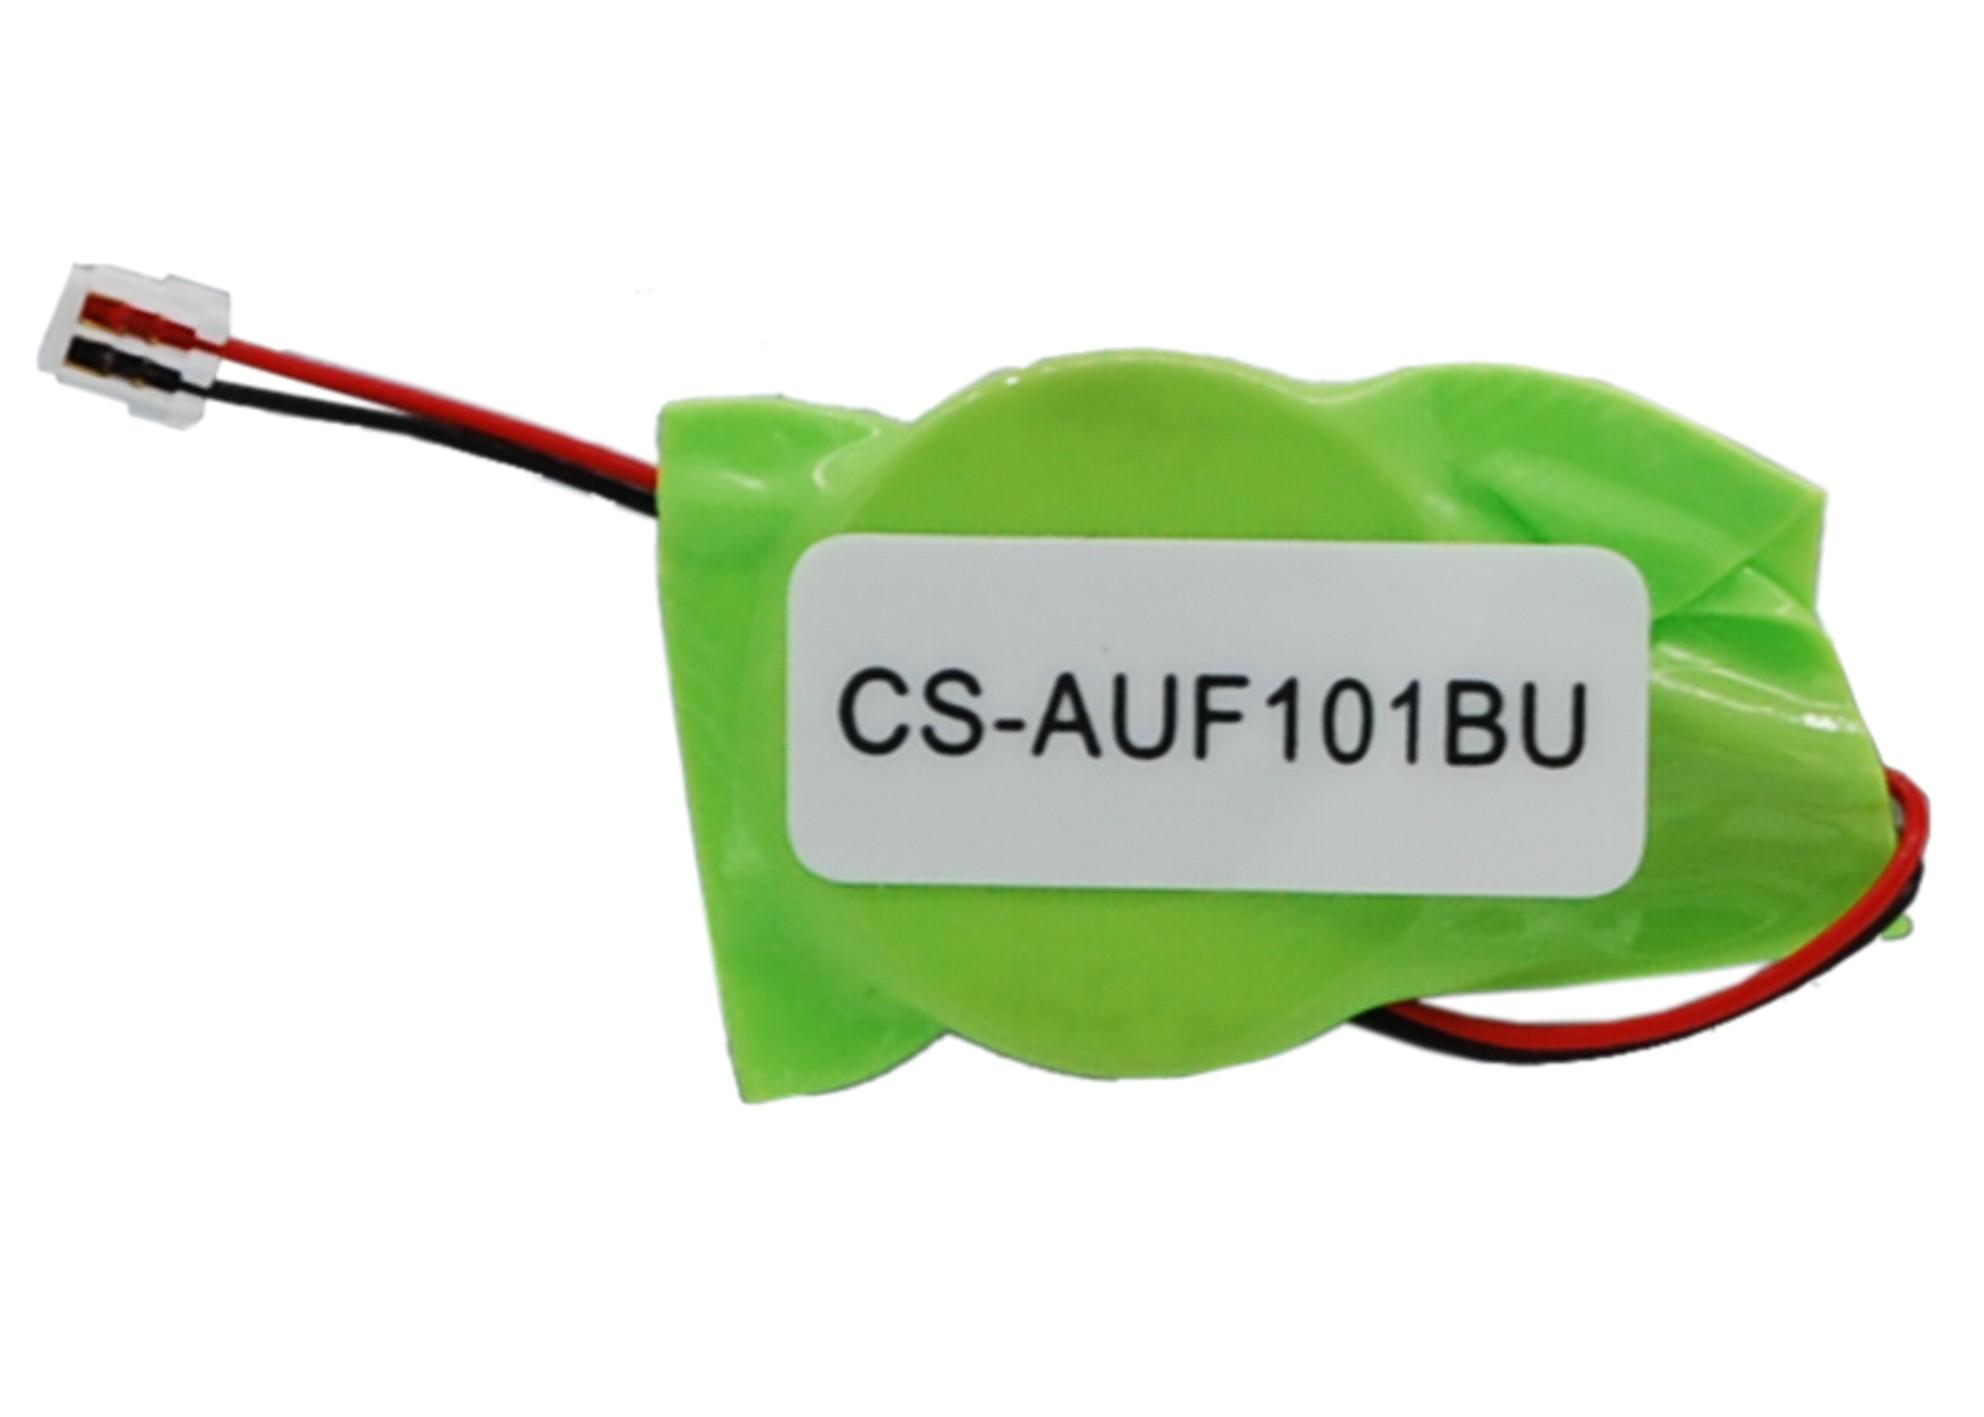 Cameron Sino baterie cmos pro ASUS Eee Pad Transformer TF101-1B003A 3V Li-ion 40mAh zelená - neoriginální